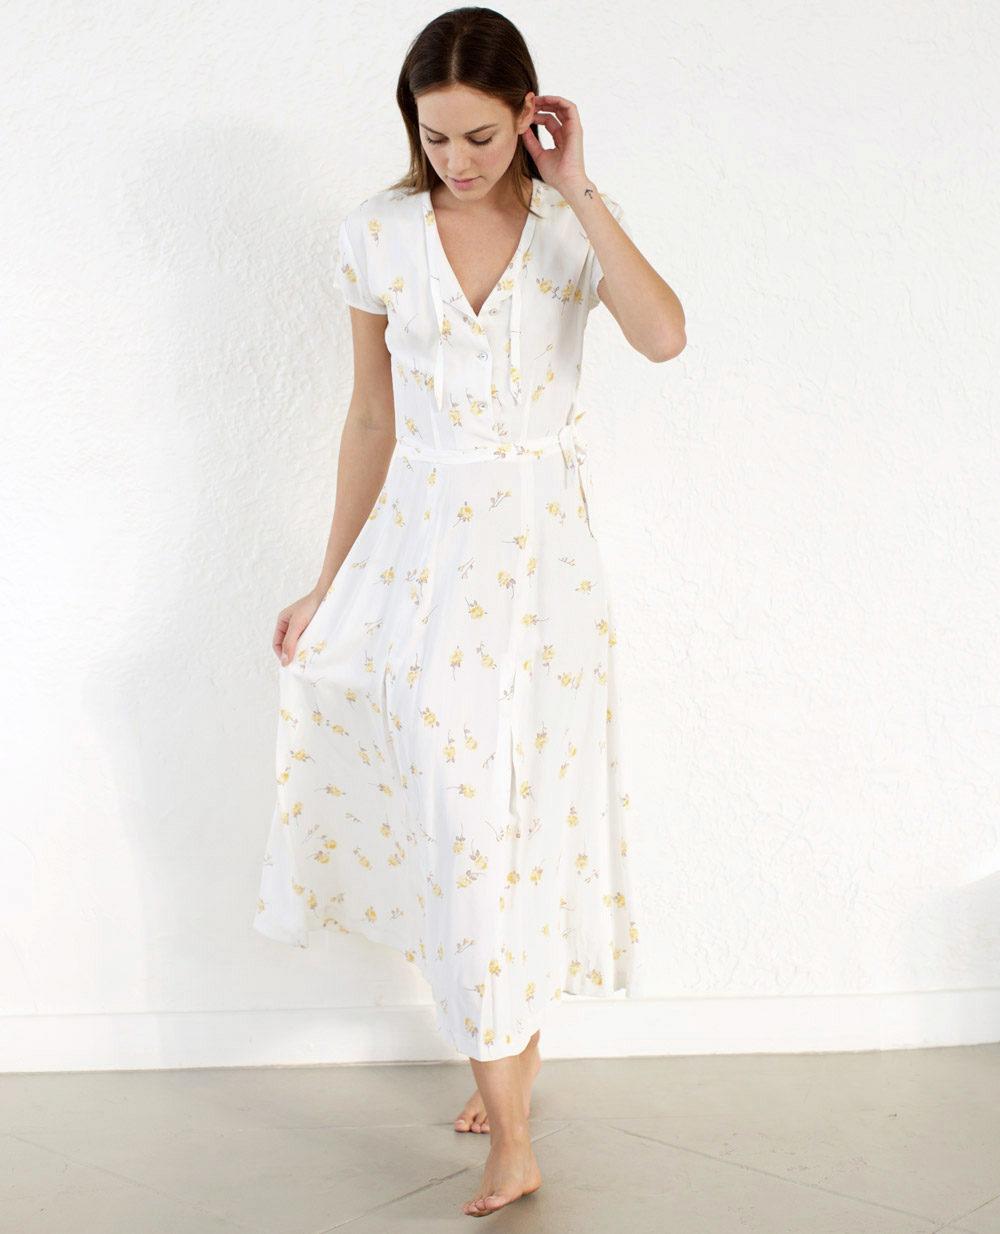 TheClothespinn.com | Colette Dress Rosebud Print